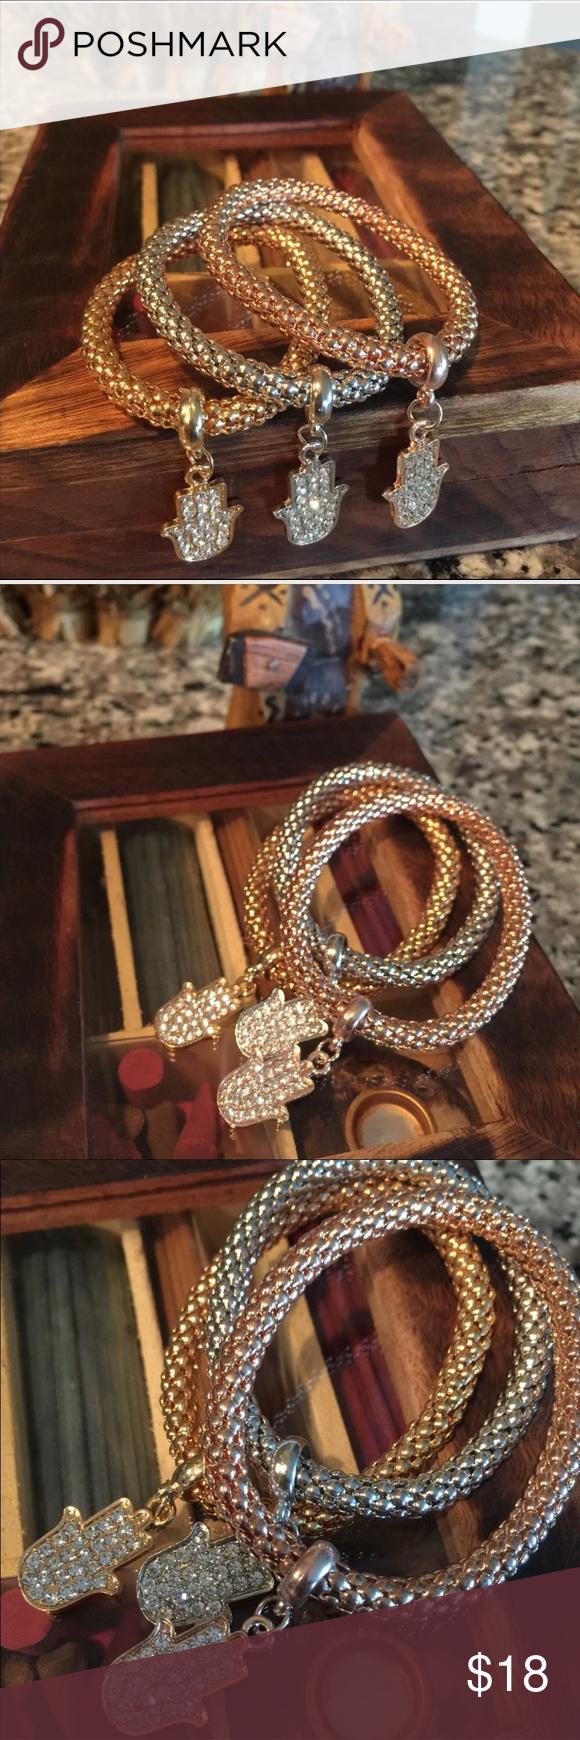 pcs bracelets set elegant design very beautiful bracelet set